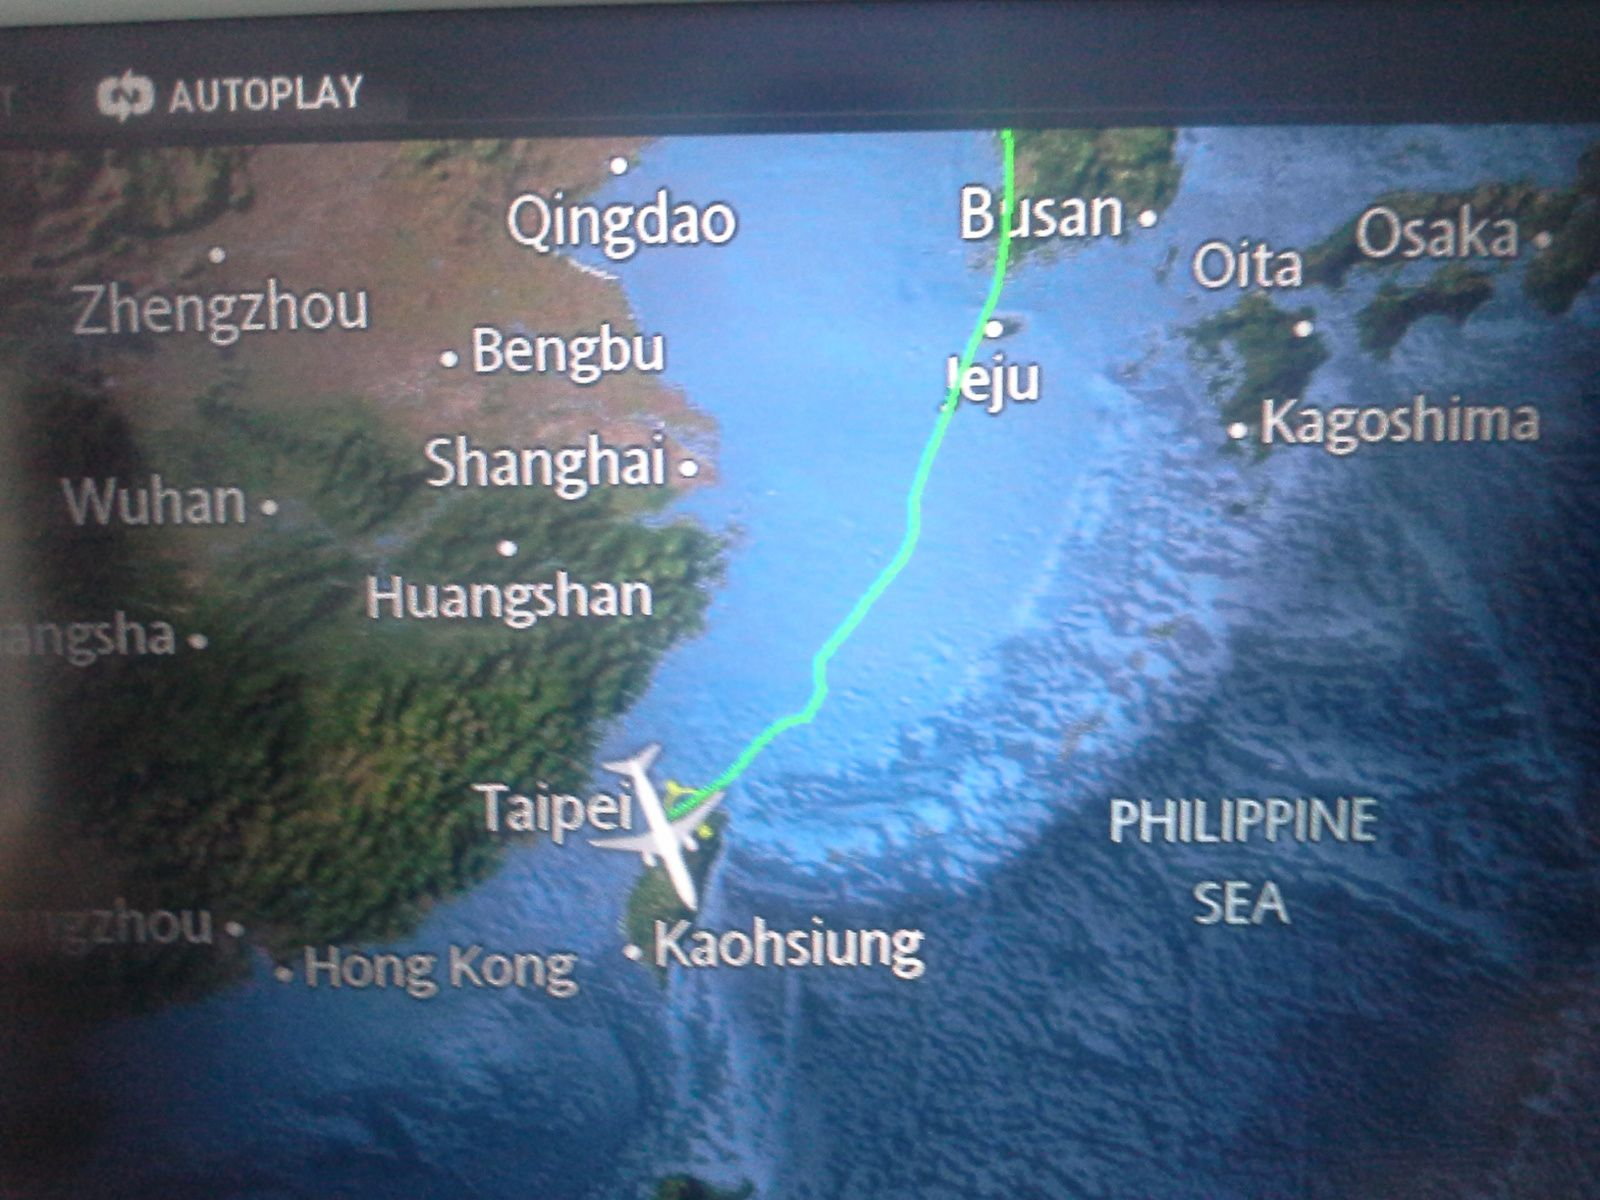 arrivee en avion depuis seoul